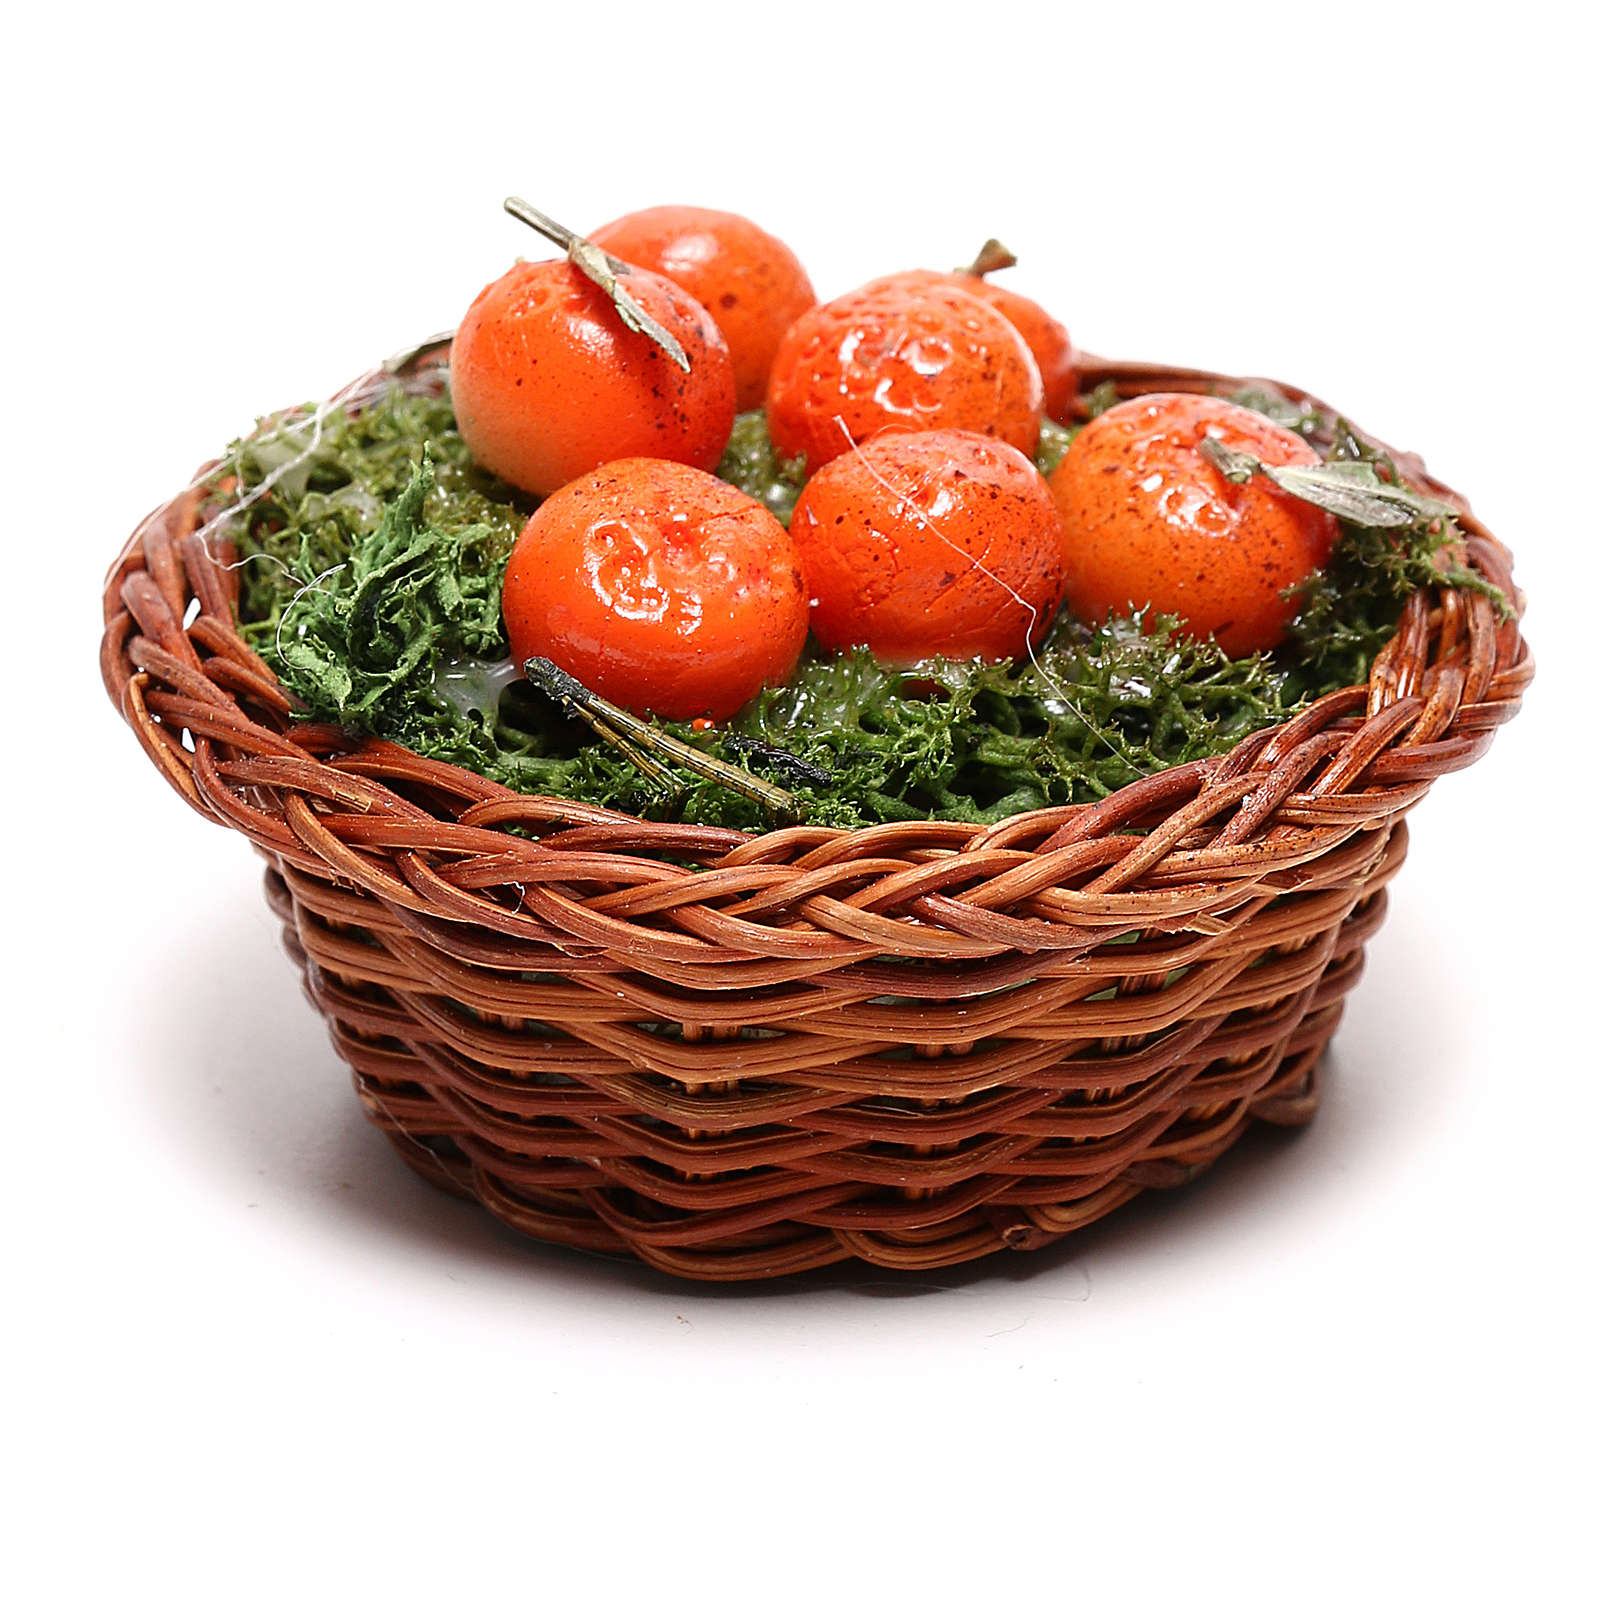 Round basket with oranges for Neapolitan Nativity scene of 24 cm 4